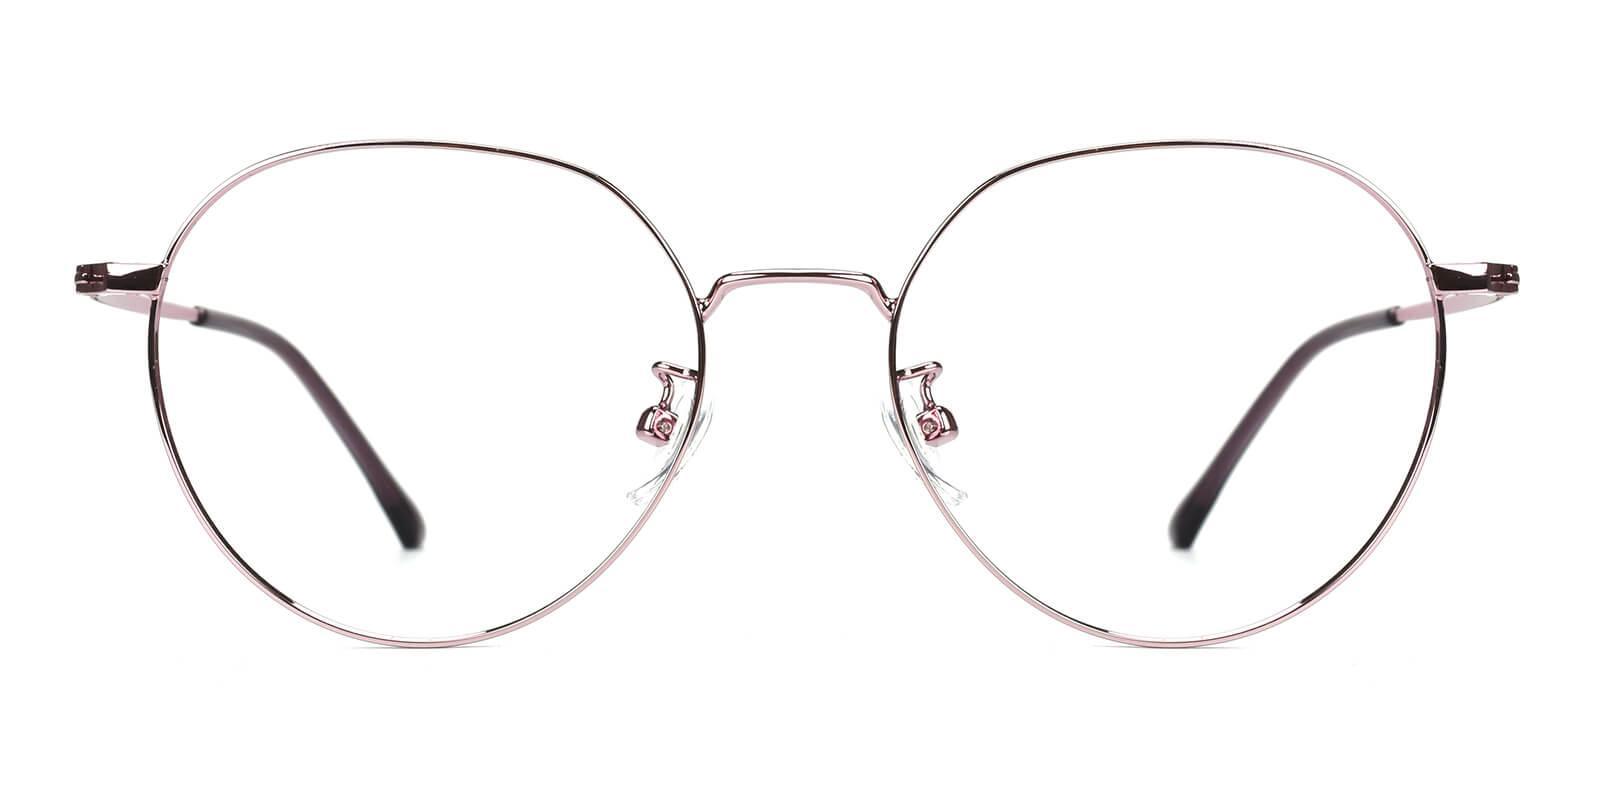 Amorous-Purple-Round-Metal-Eyeglasses-additional2